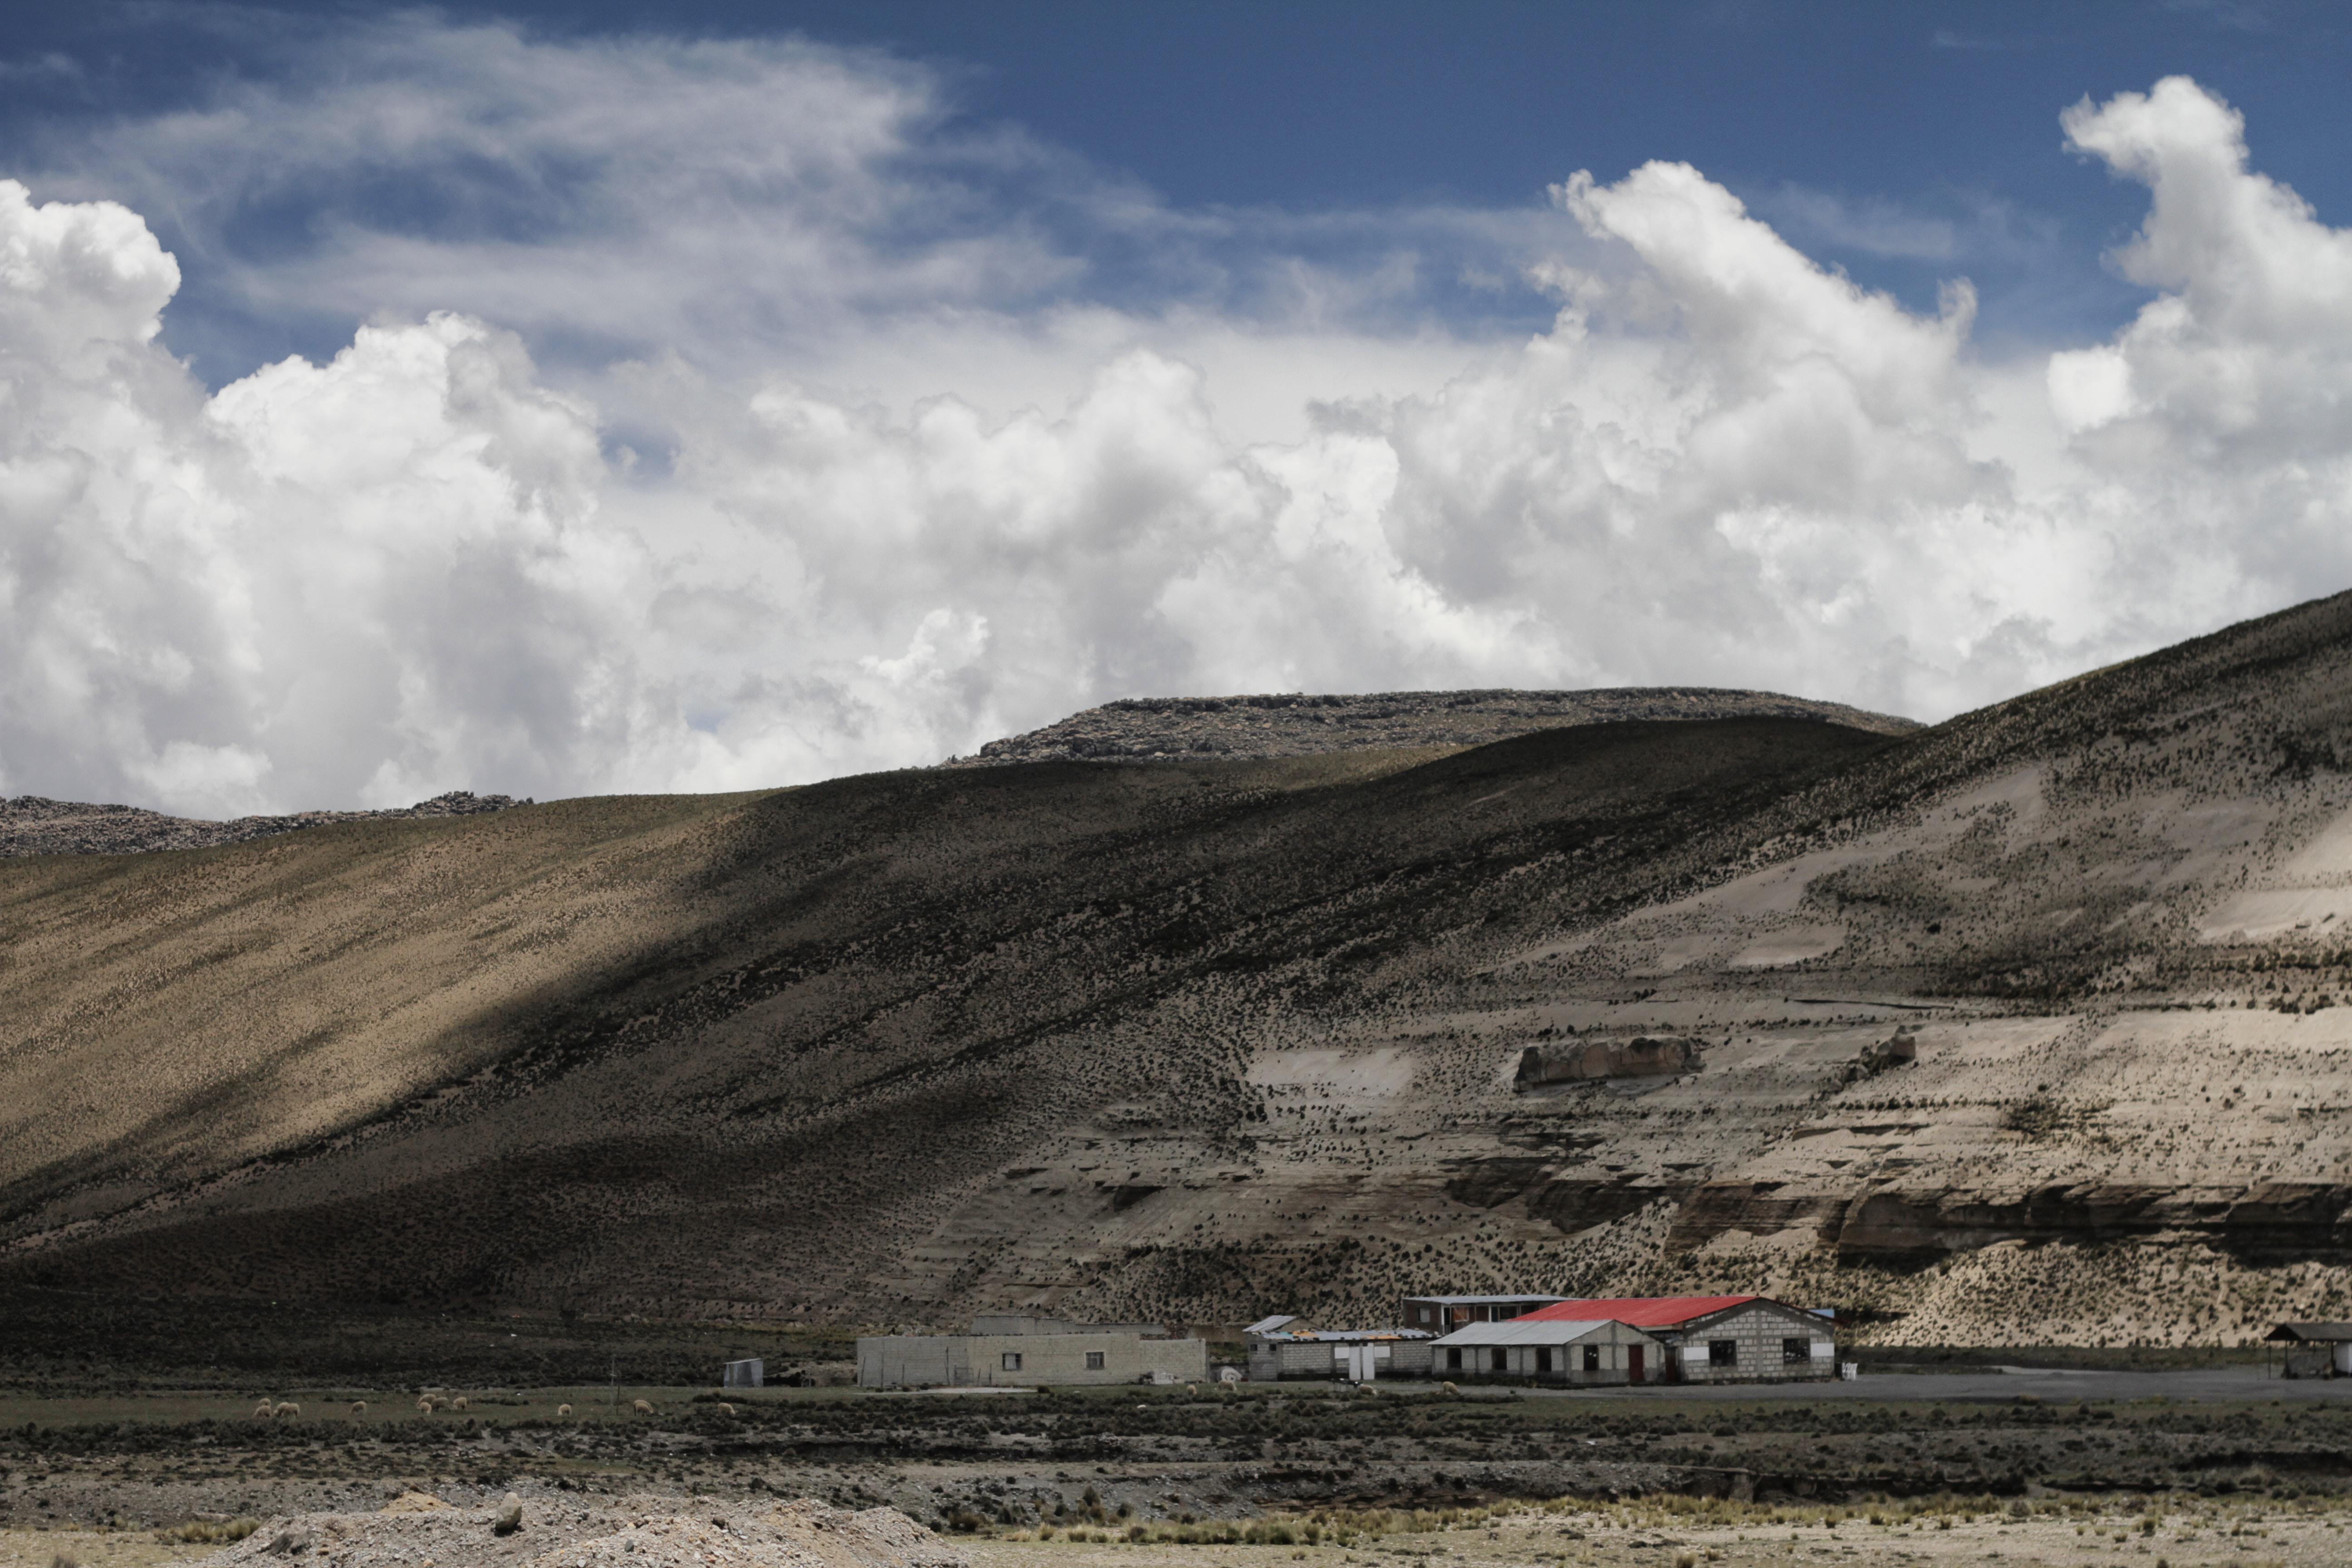 white concrete house near mountains under white clouds